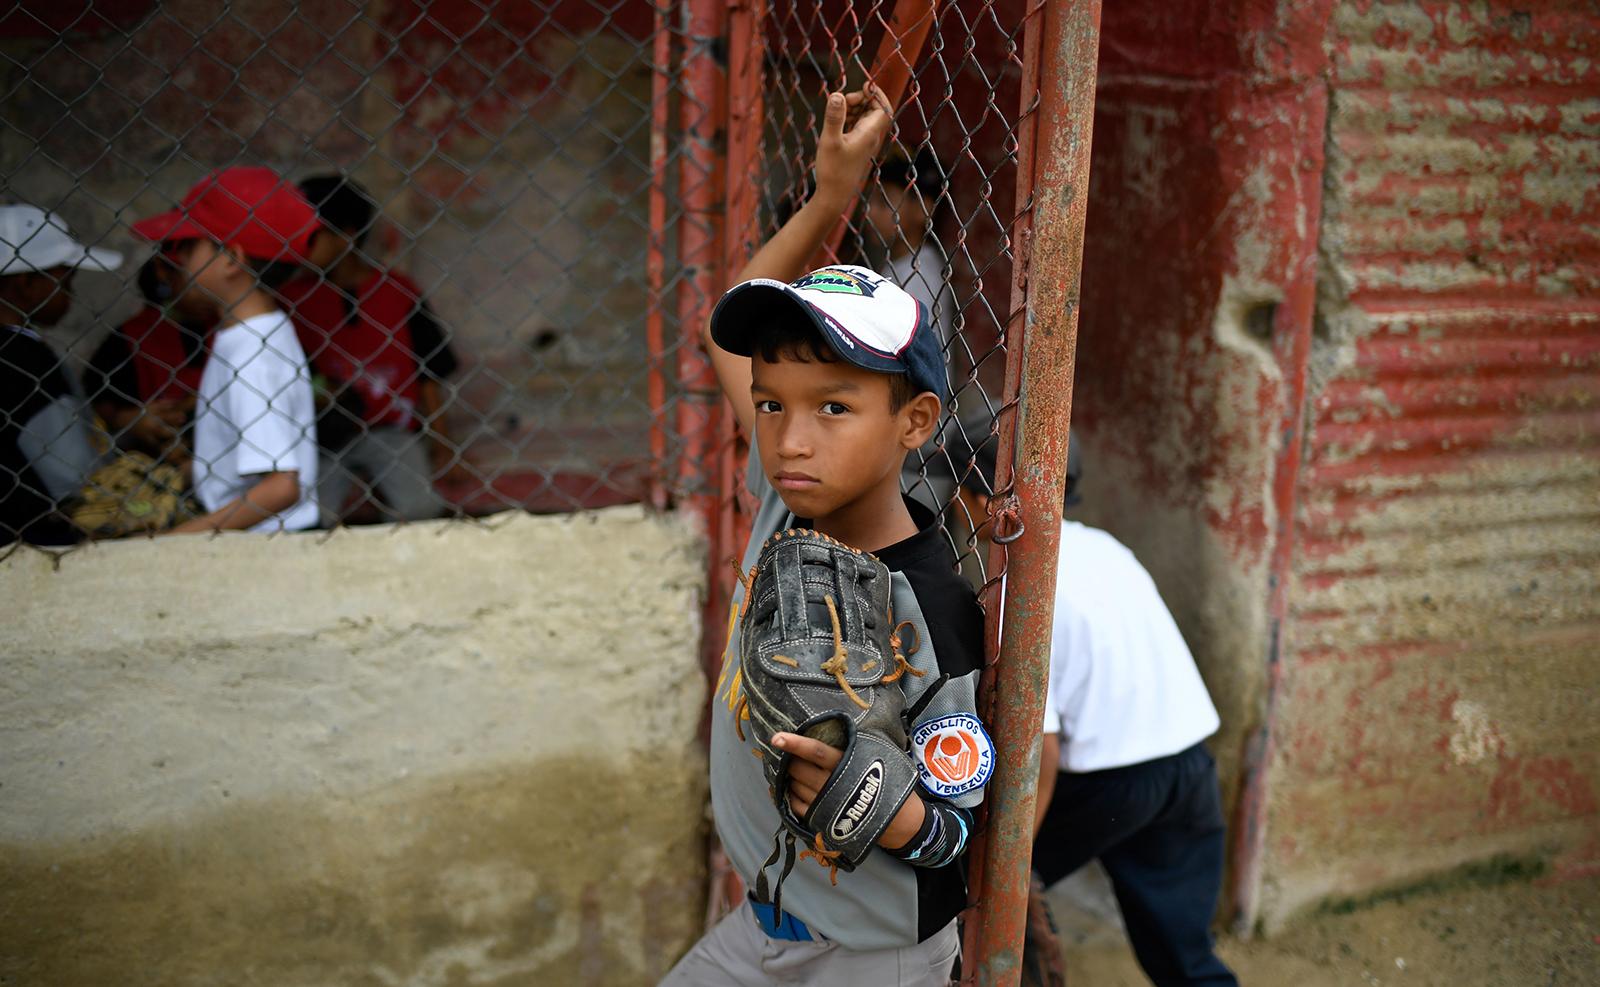 Children attend the opening of a baseball tournament at the Criollitos de Venezuela school in Casalta neighborhood, Caracas, on October 25, 2019. AFP